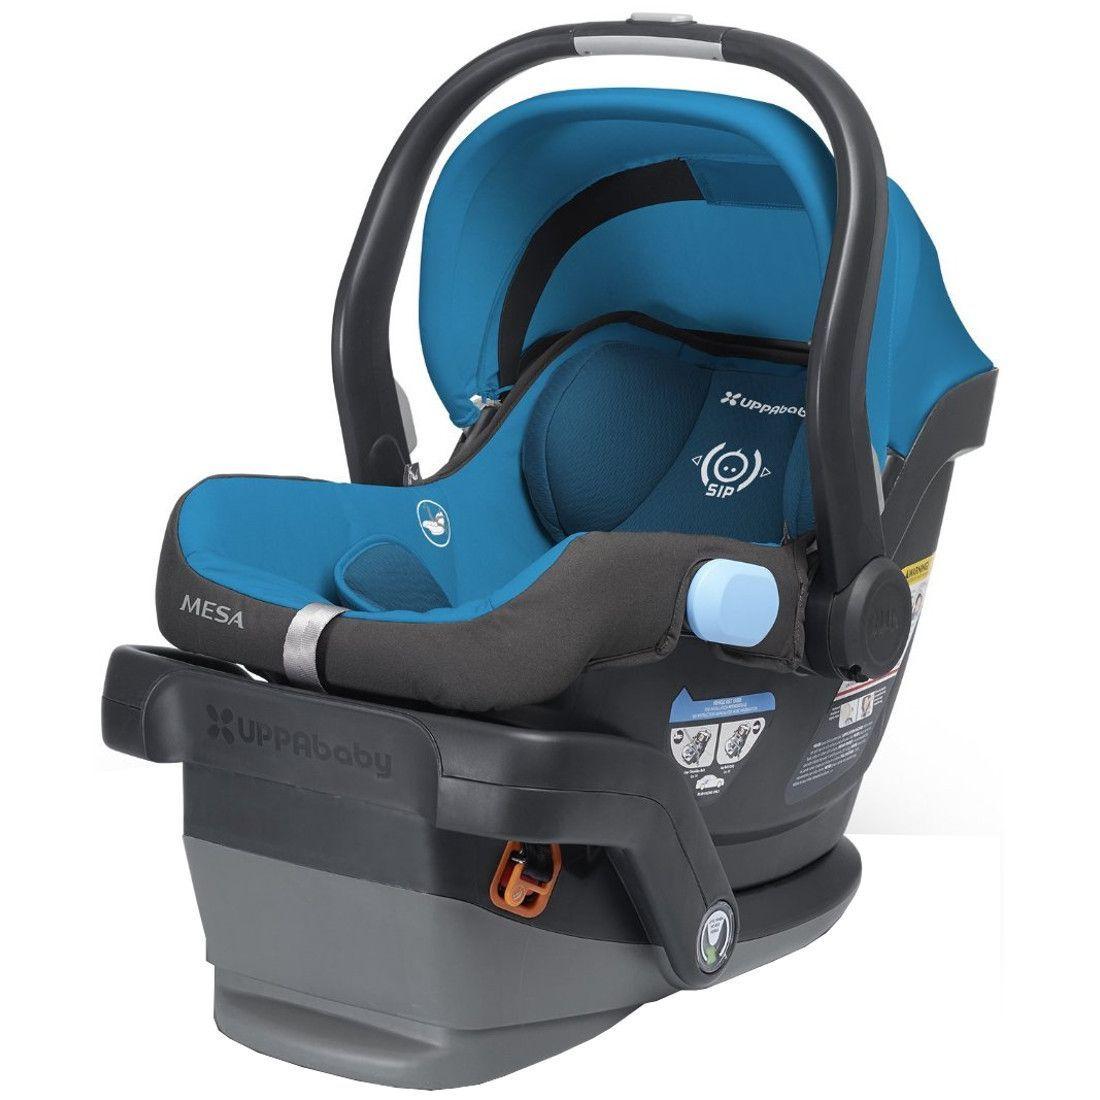 UPPAbaby Mesa Infant Car Seat 2015, (Marine Blue